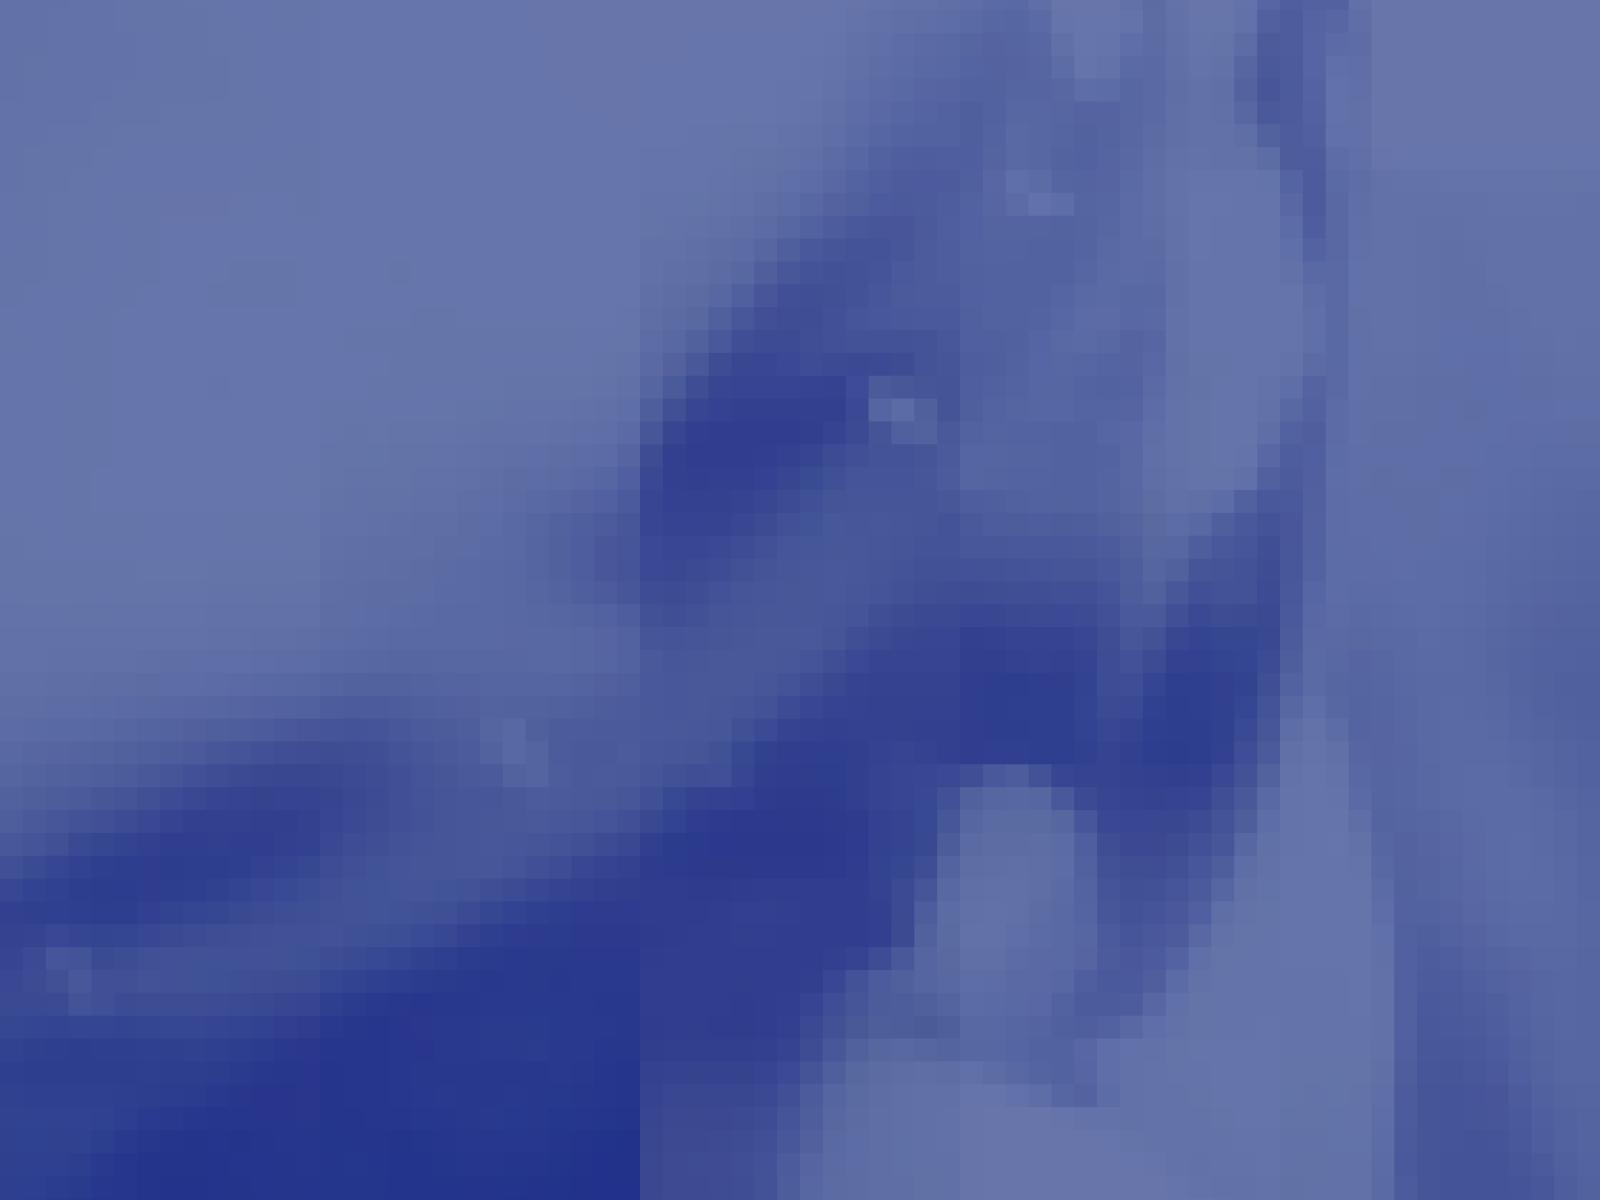 Polybeat - Deconstructing Shanks Putwain2.jpg